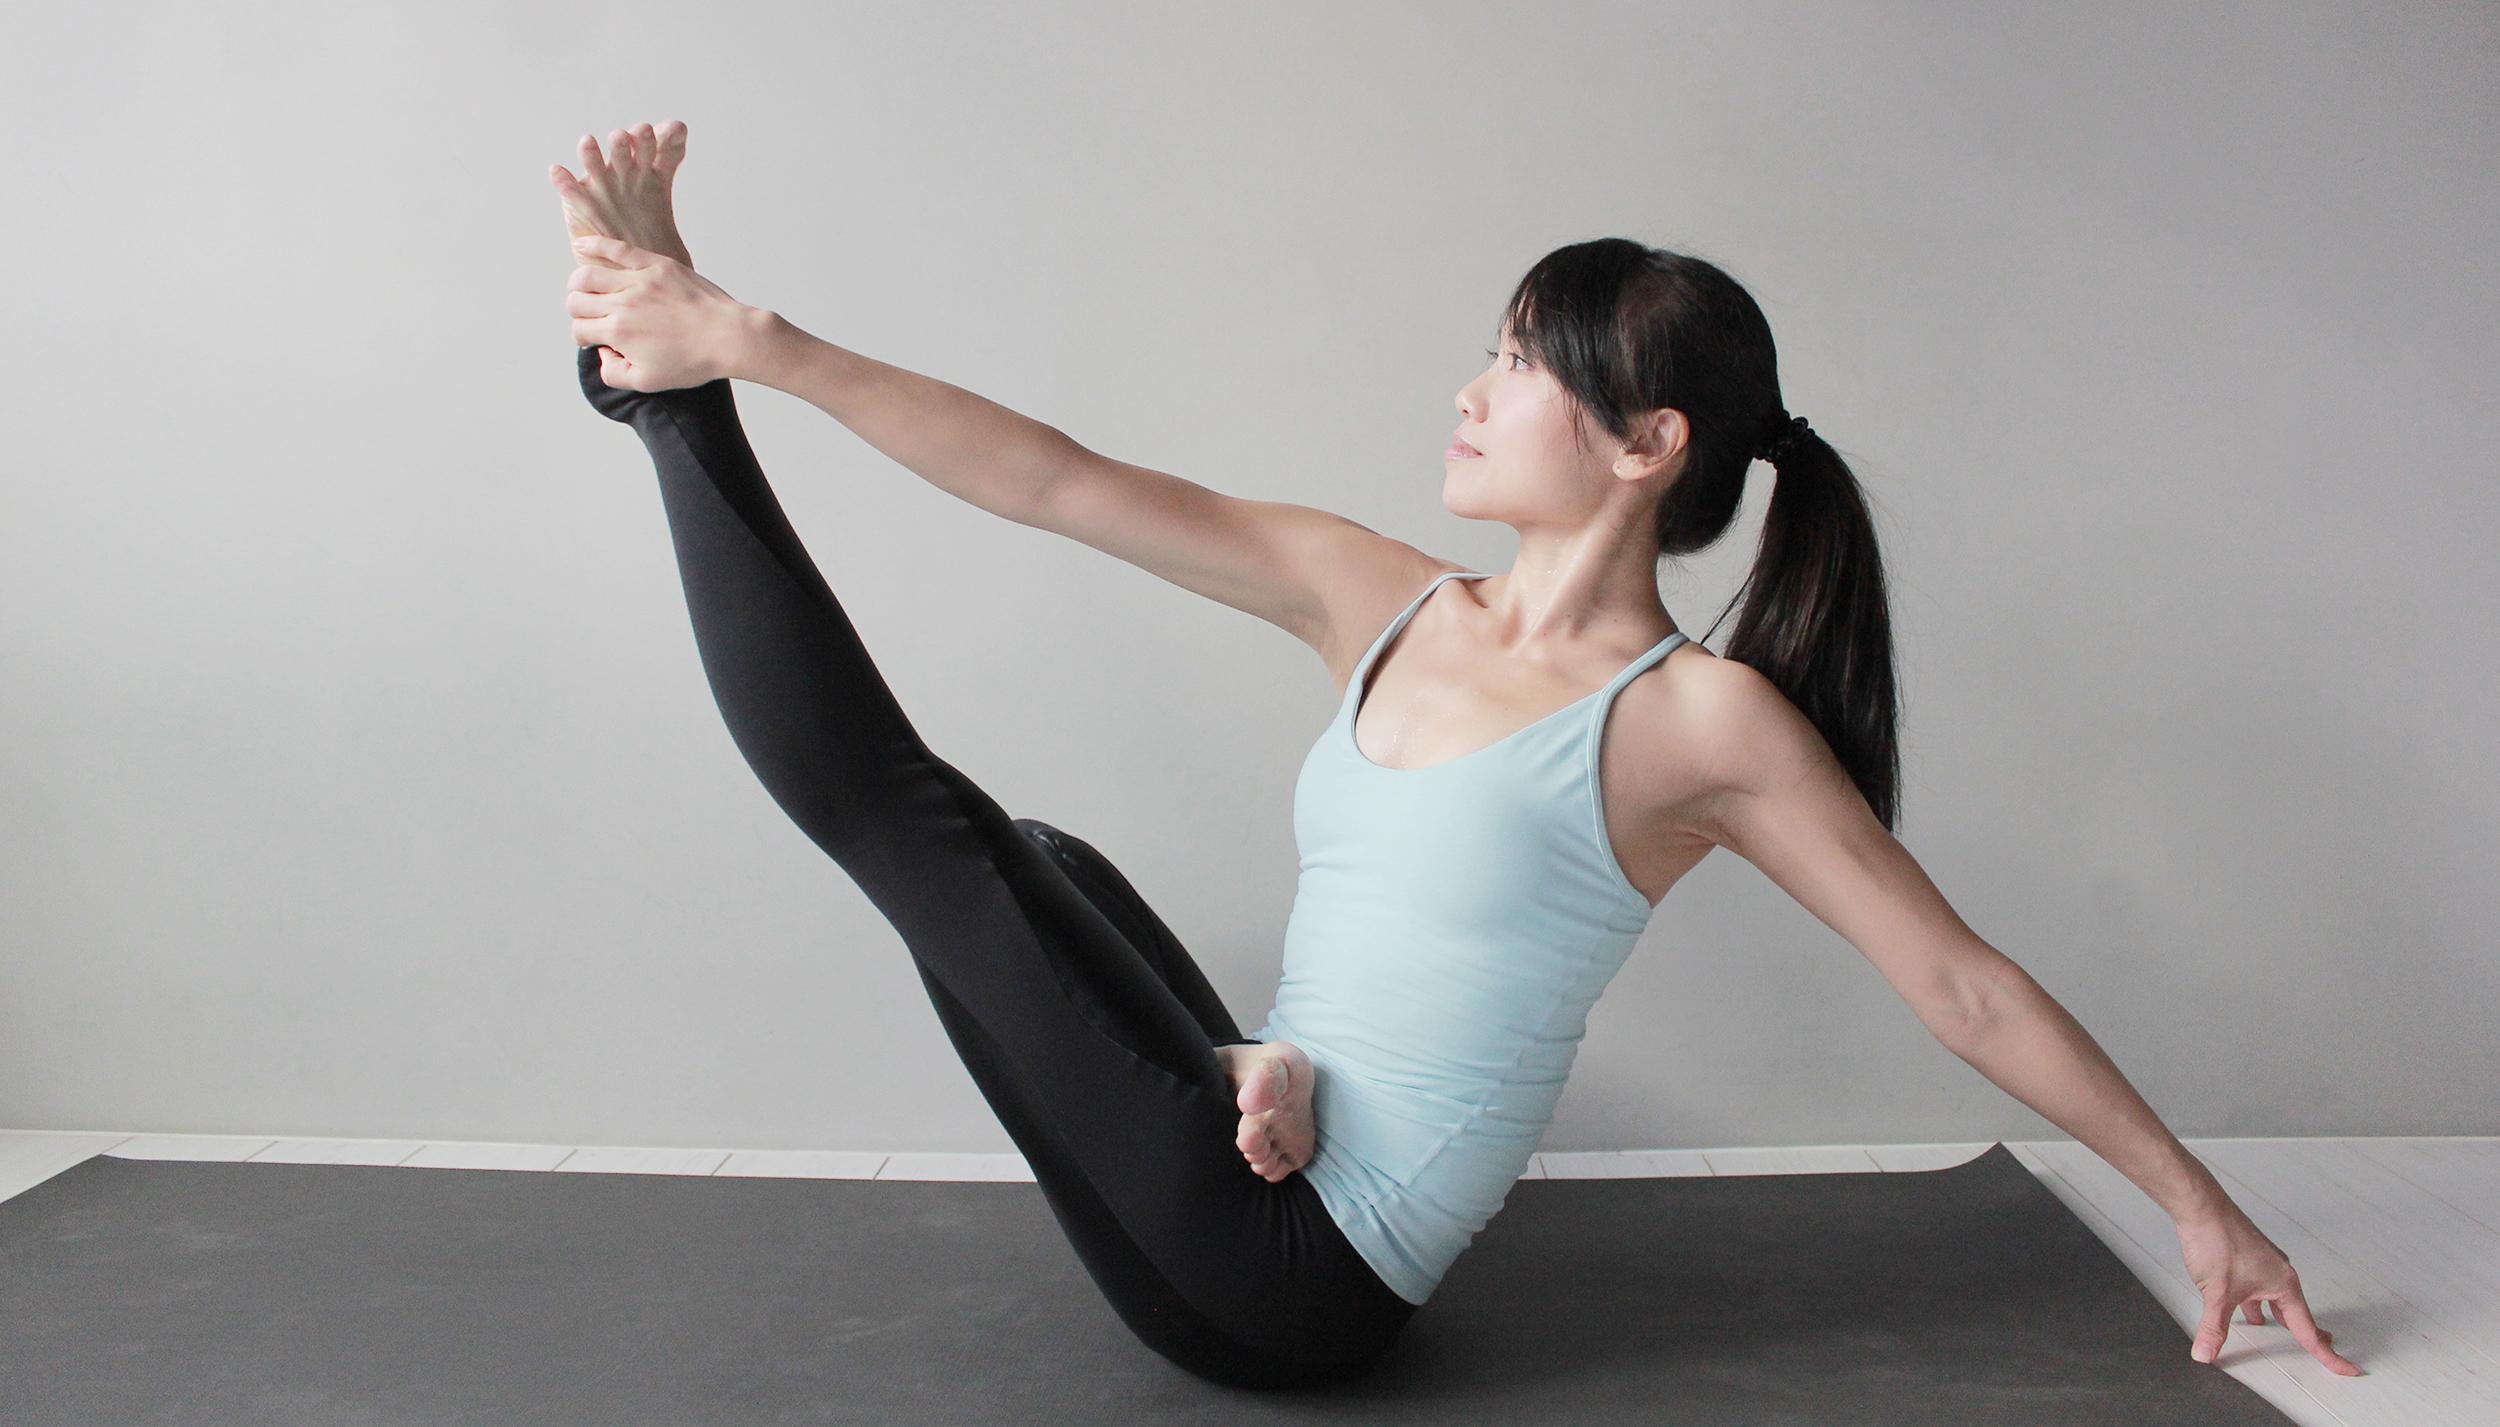 Yoga Teacher — Malina<br /><p>一開始練習瑜珈是為了把舞跳好。從小不愛運動的我在大學時期誤打誤撞參加了國標社,此後開啟學舞之路,隨著練習時間增加,大大小小的比賽與表演接踵而至</p>